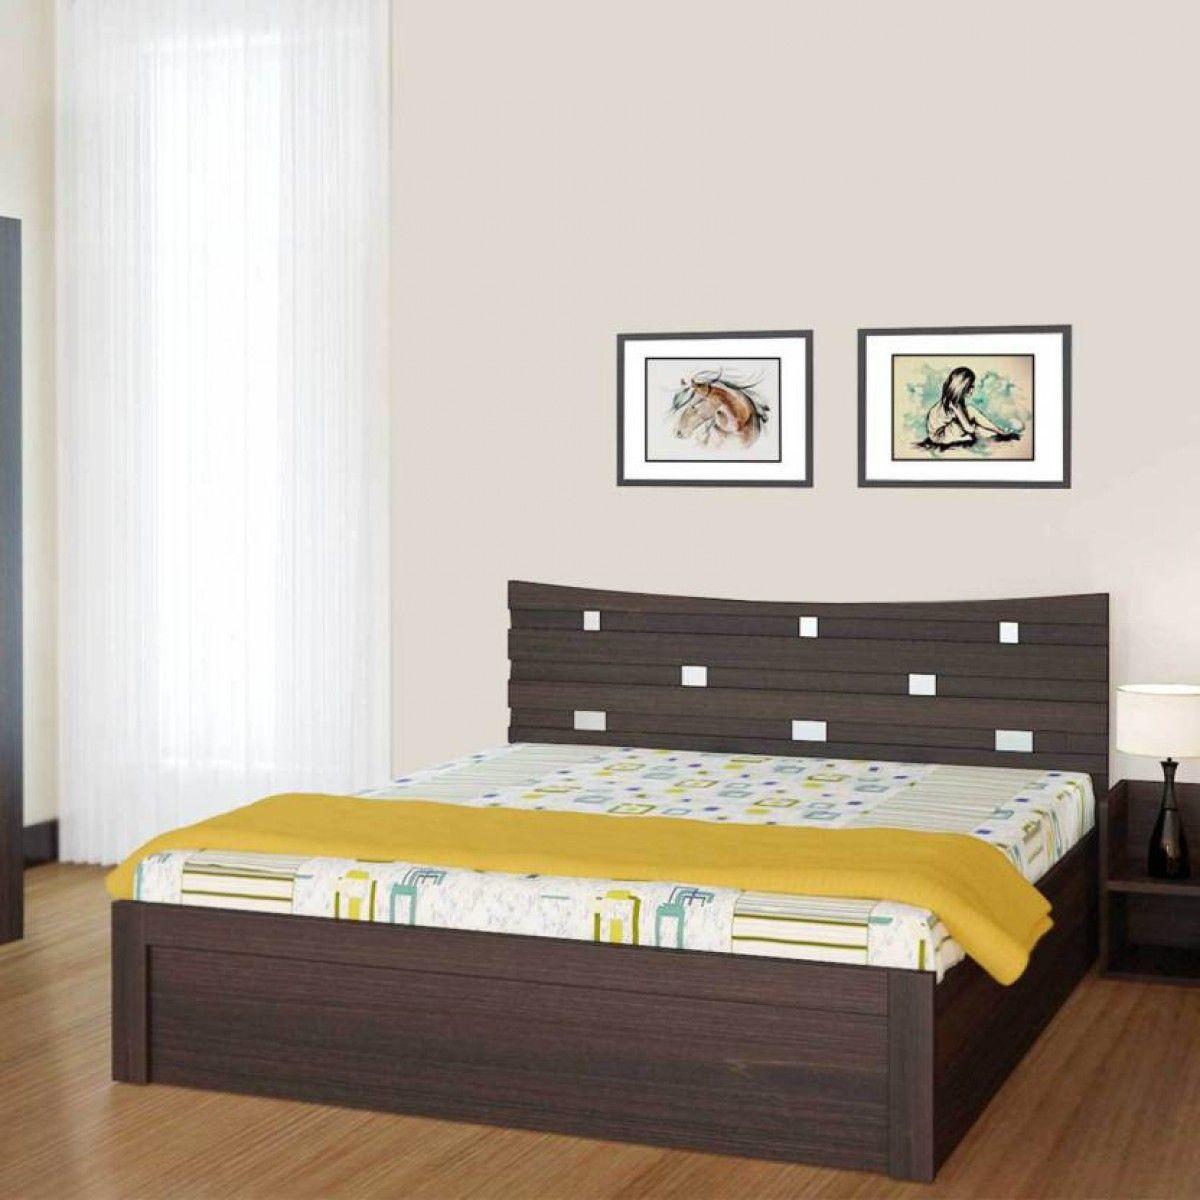 Gorevizon Crescent Created King Size Storage Bed King Size Bed Designs Bed Designs With Storage Bedroom Bed Design